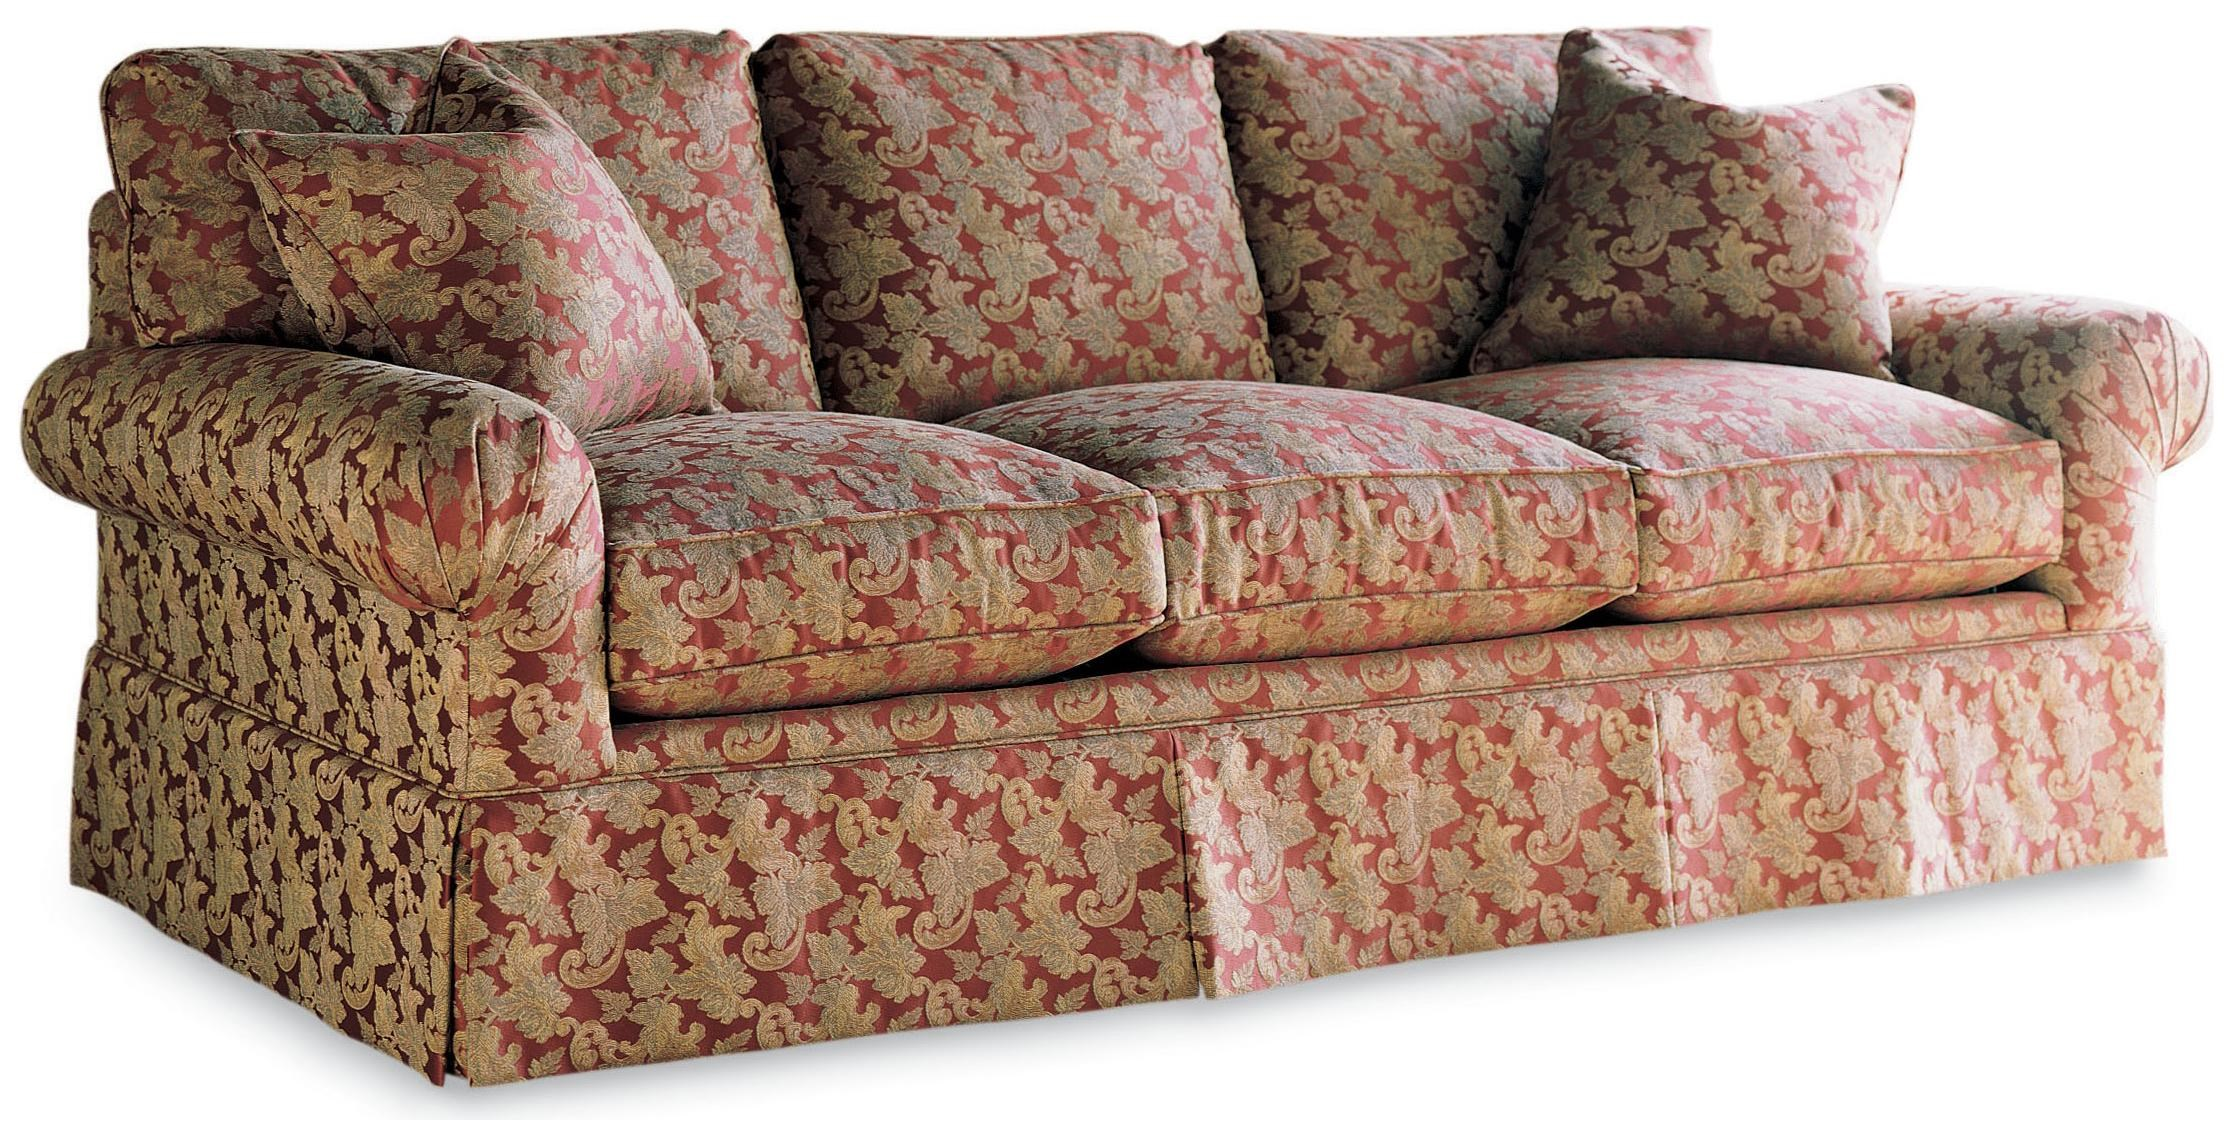 Drexel Drexel Heritage UpholsteryNatalie Sofa ...